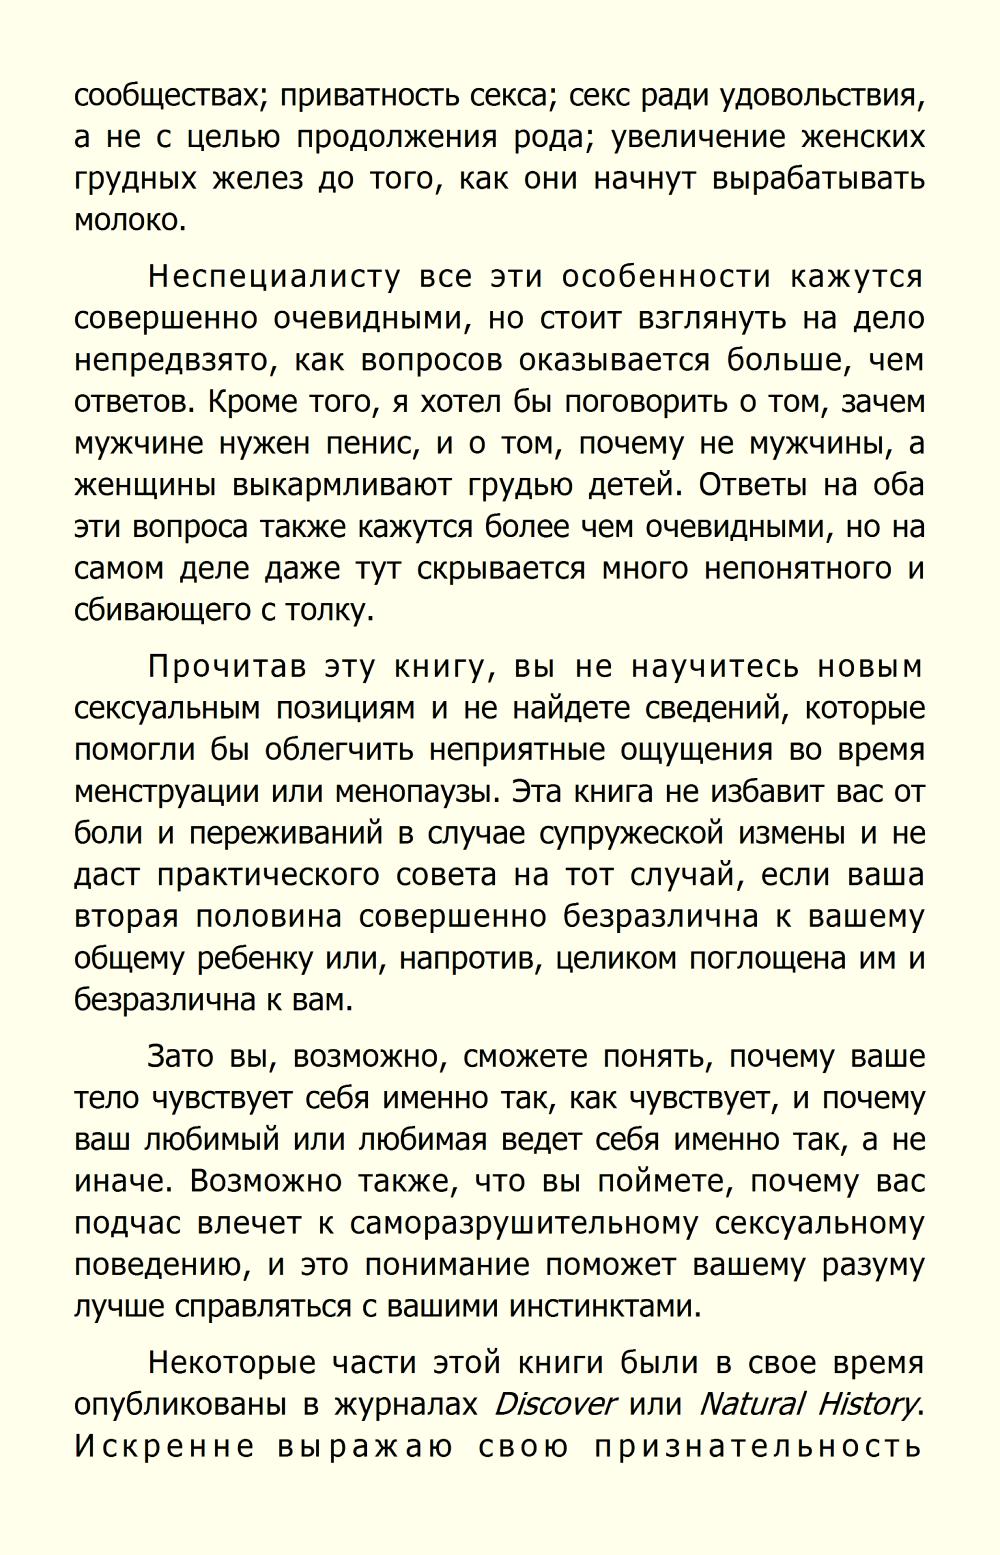 http://i2.imageban.ru/out/2014/01/21/795f5f927d991da5344e5d7677e1c05d.jpg